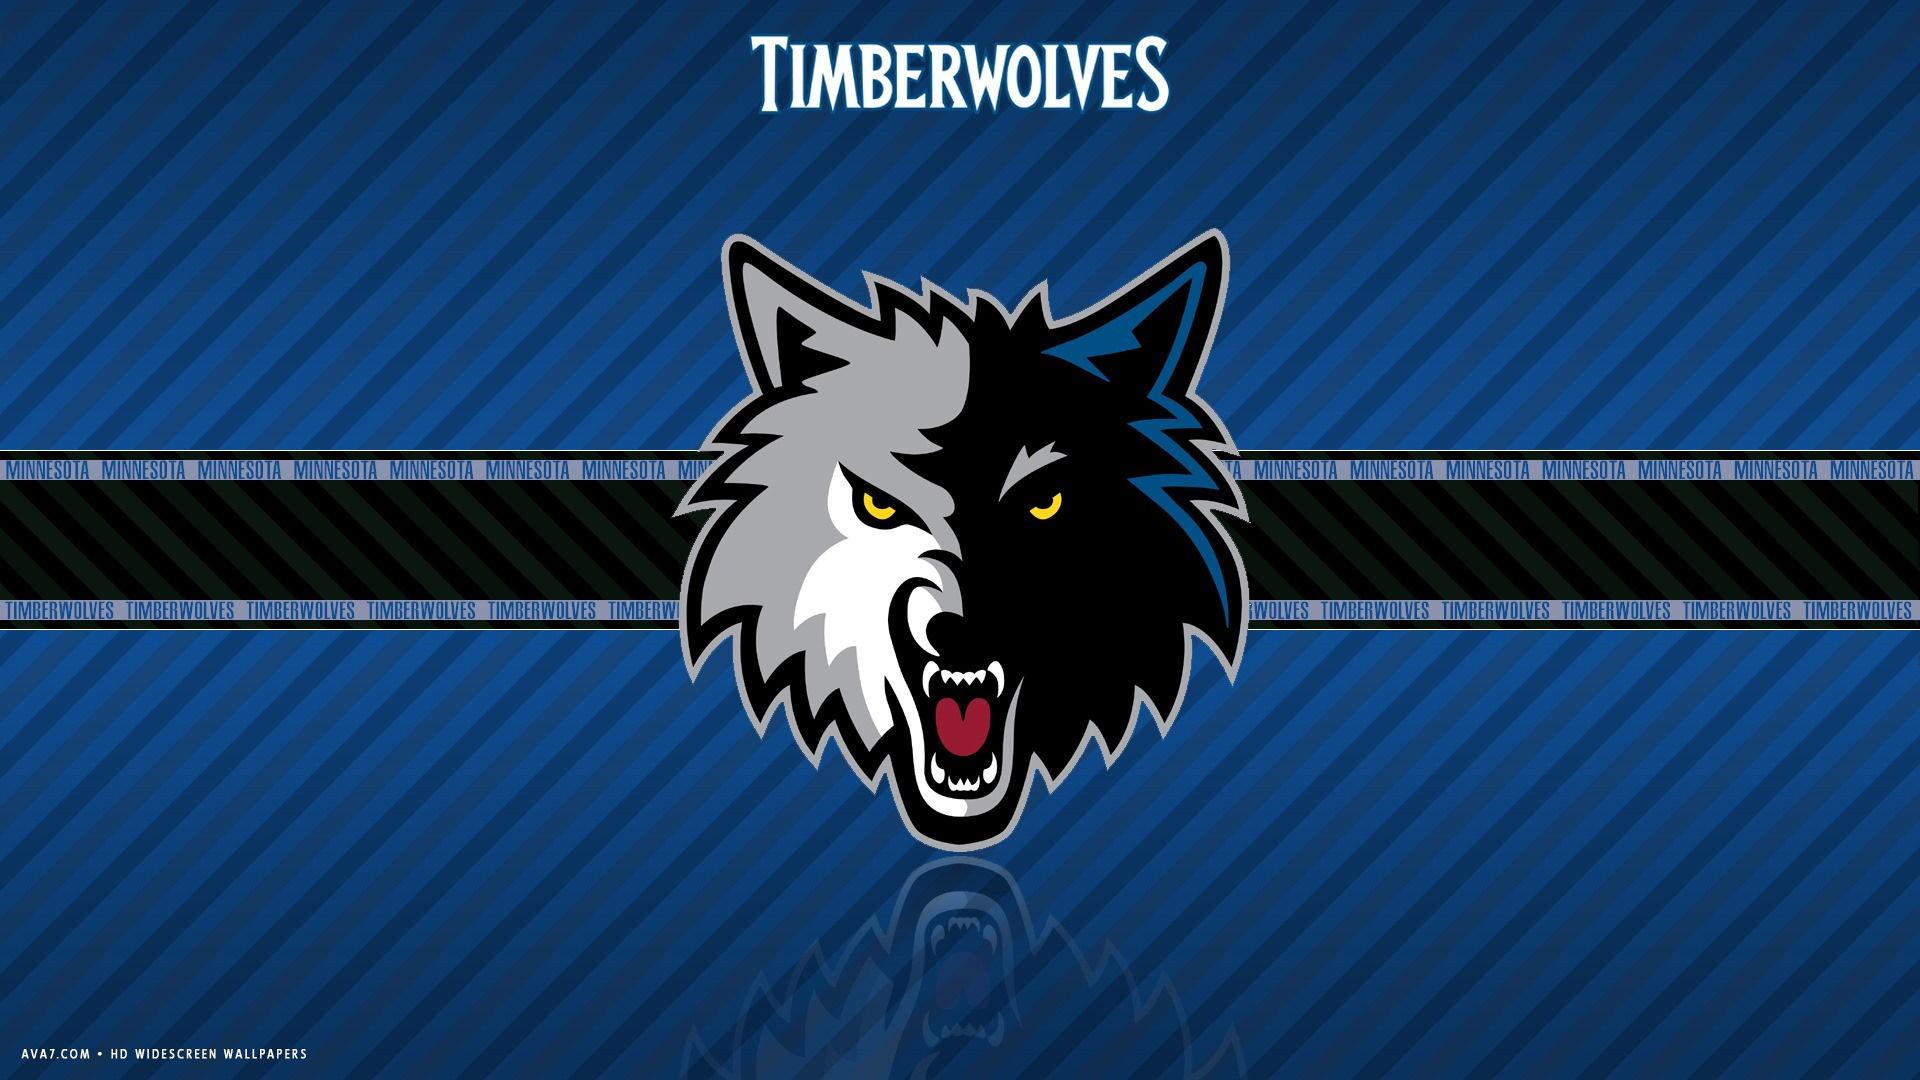 Minnesota Timberwolves Wallpaper 1920x1080